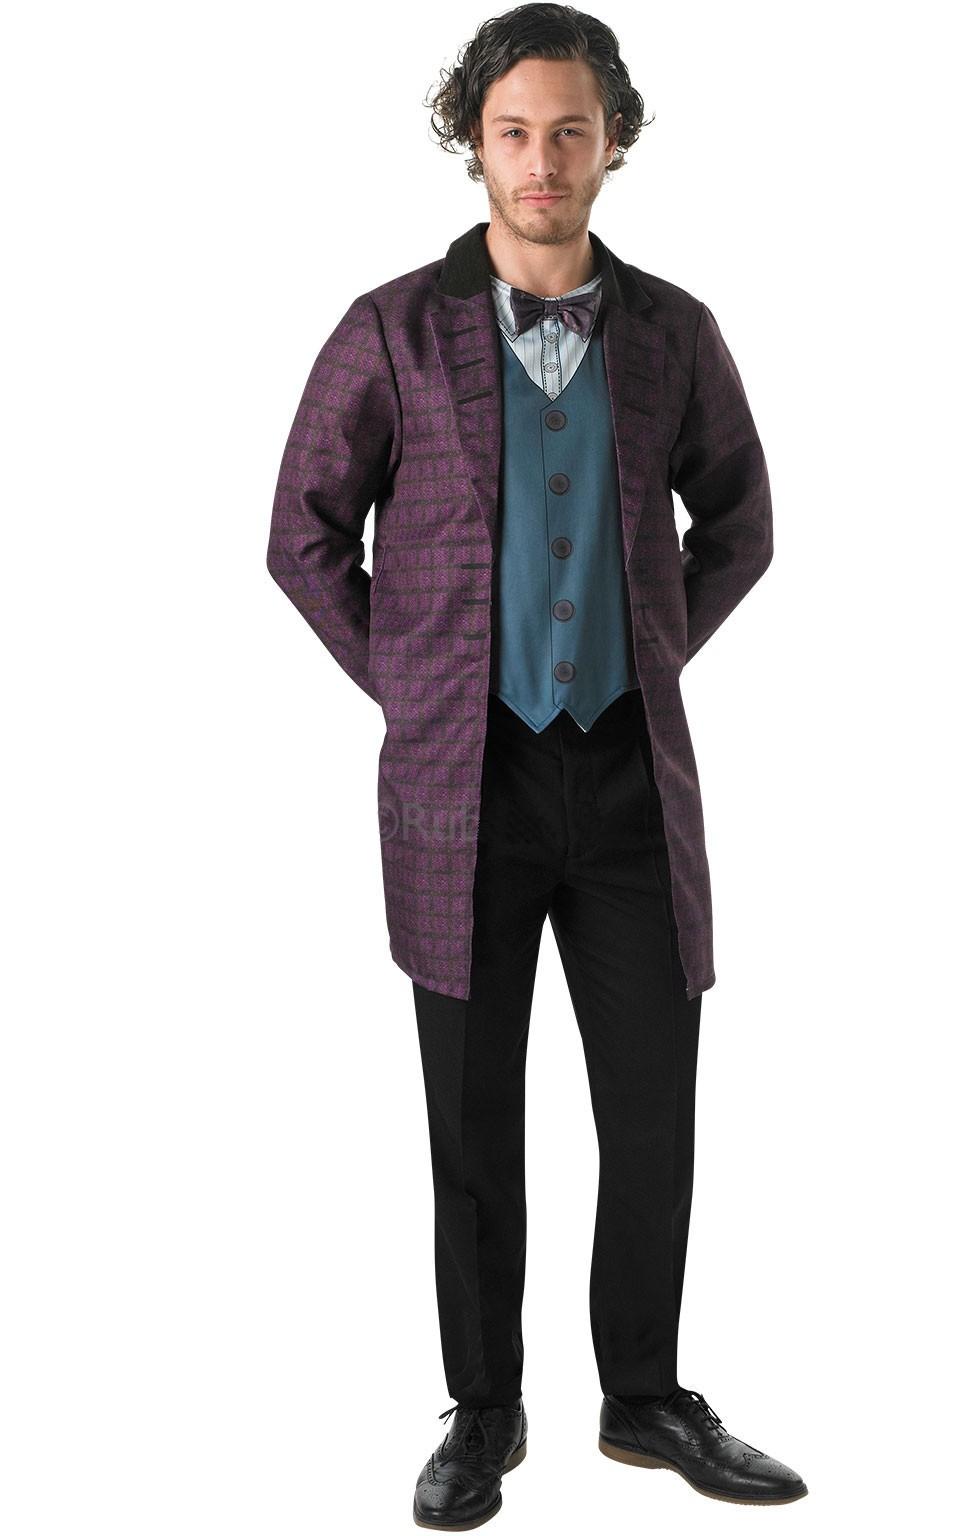 Костюм Доктор Кто (52)  клетчатый костюм красотки 48